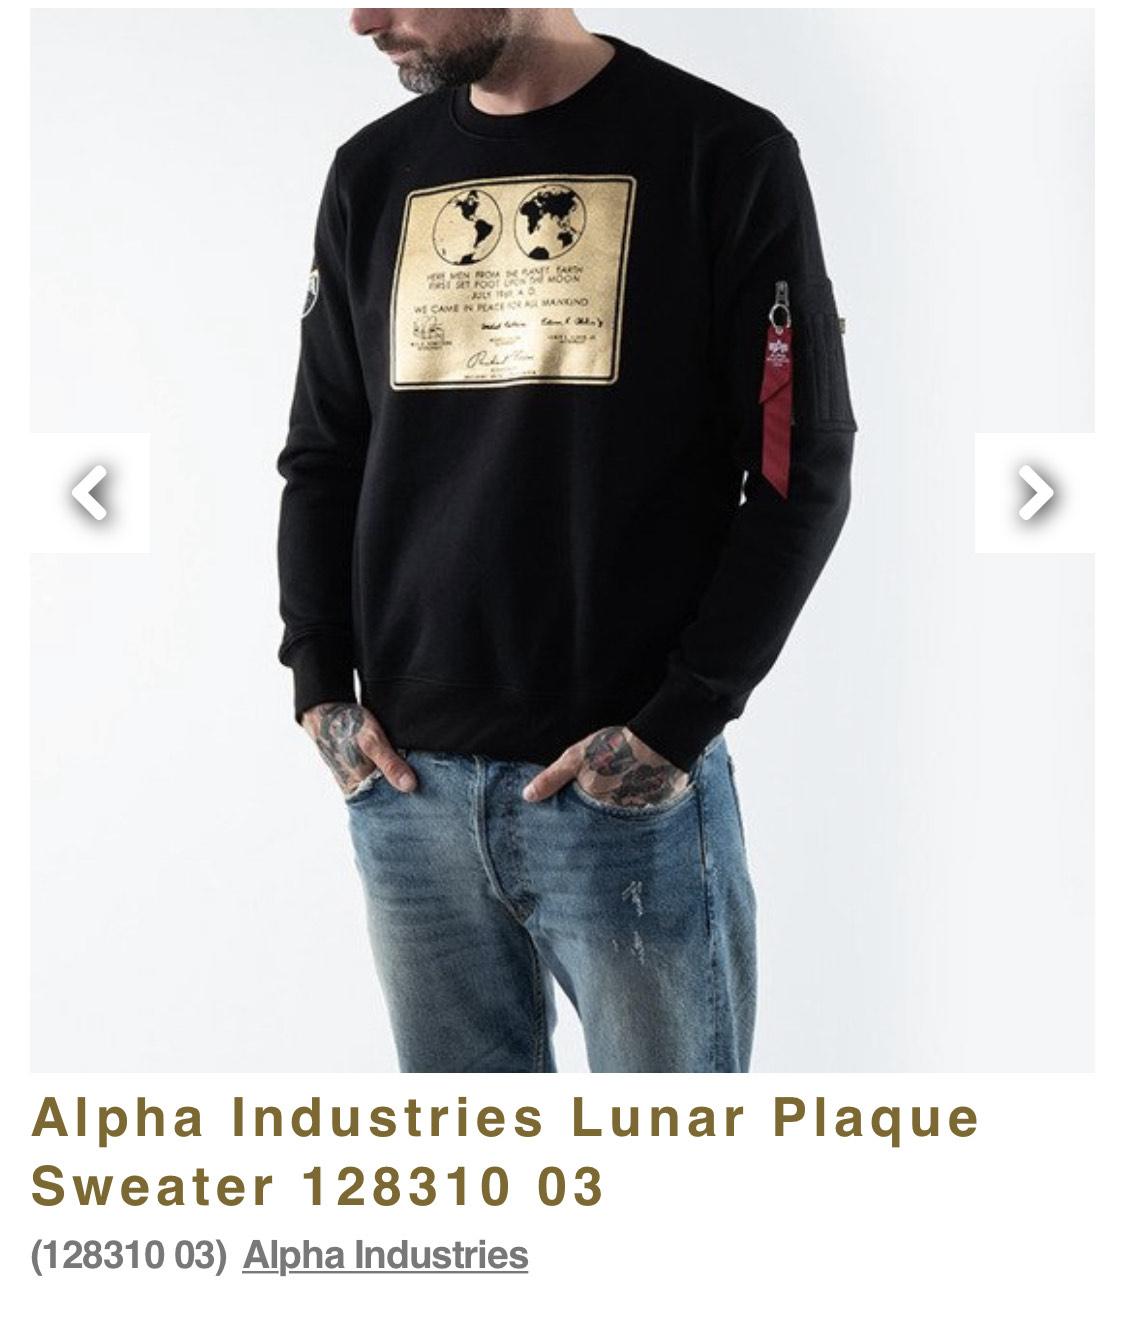 Alpha Industries Lunar Plaque Sweatshirt & weitere Deals